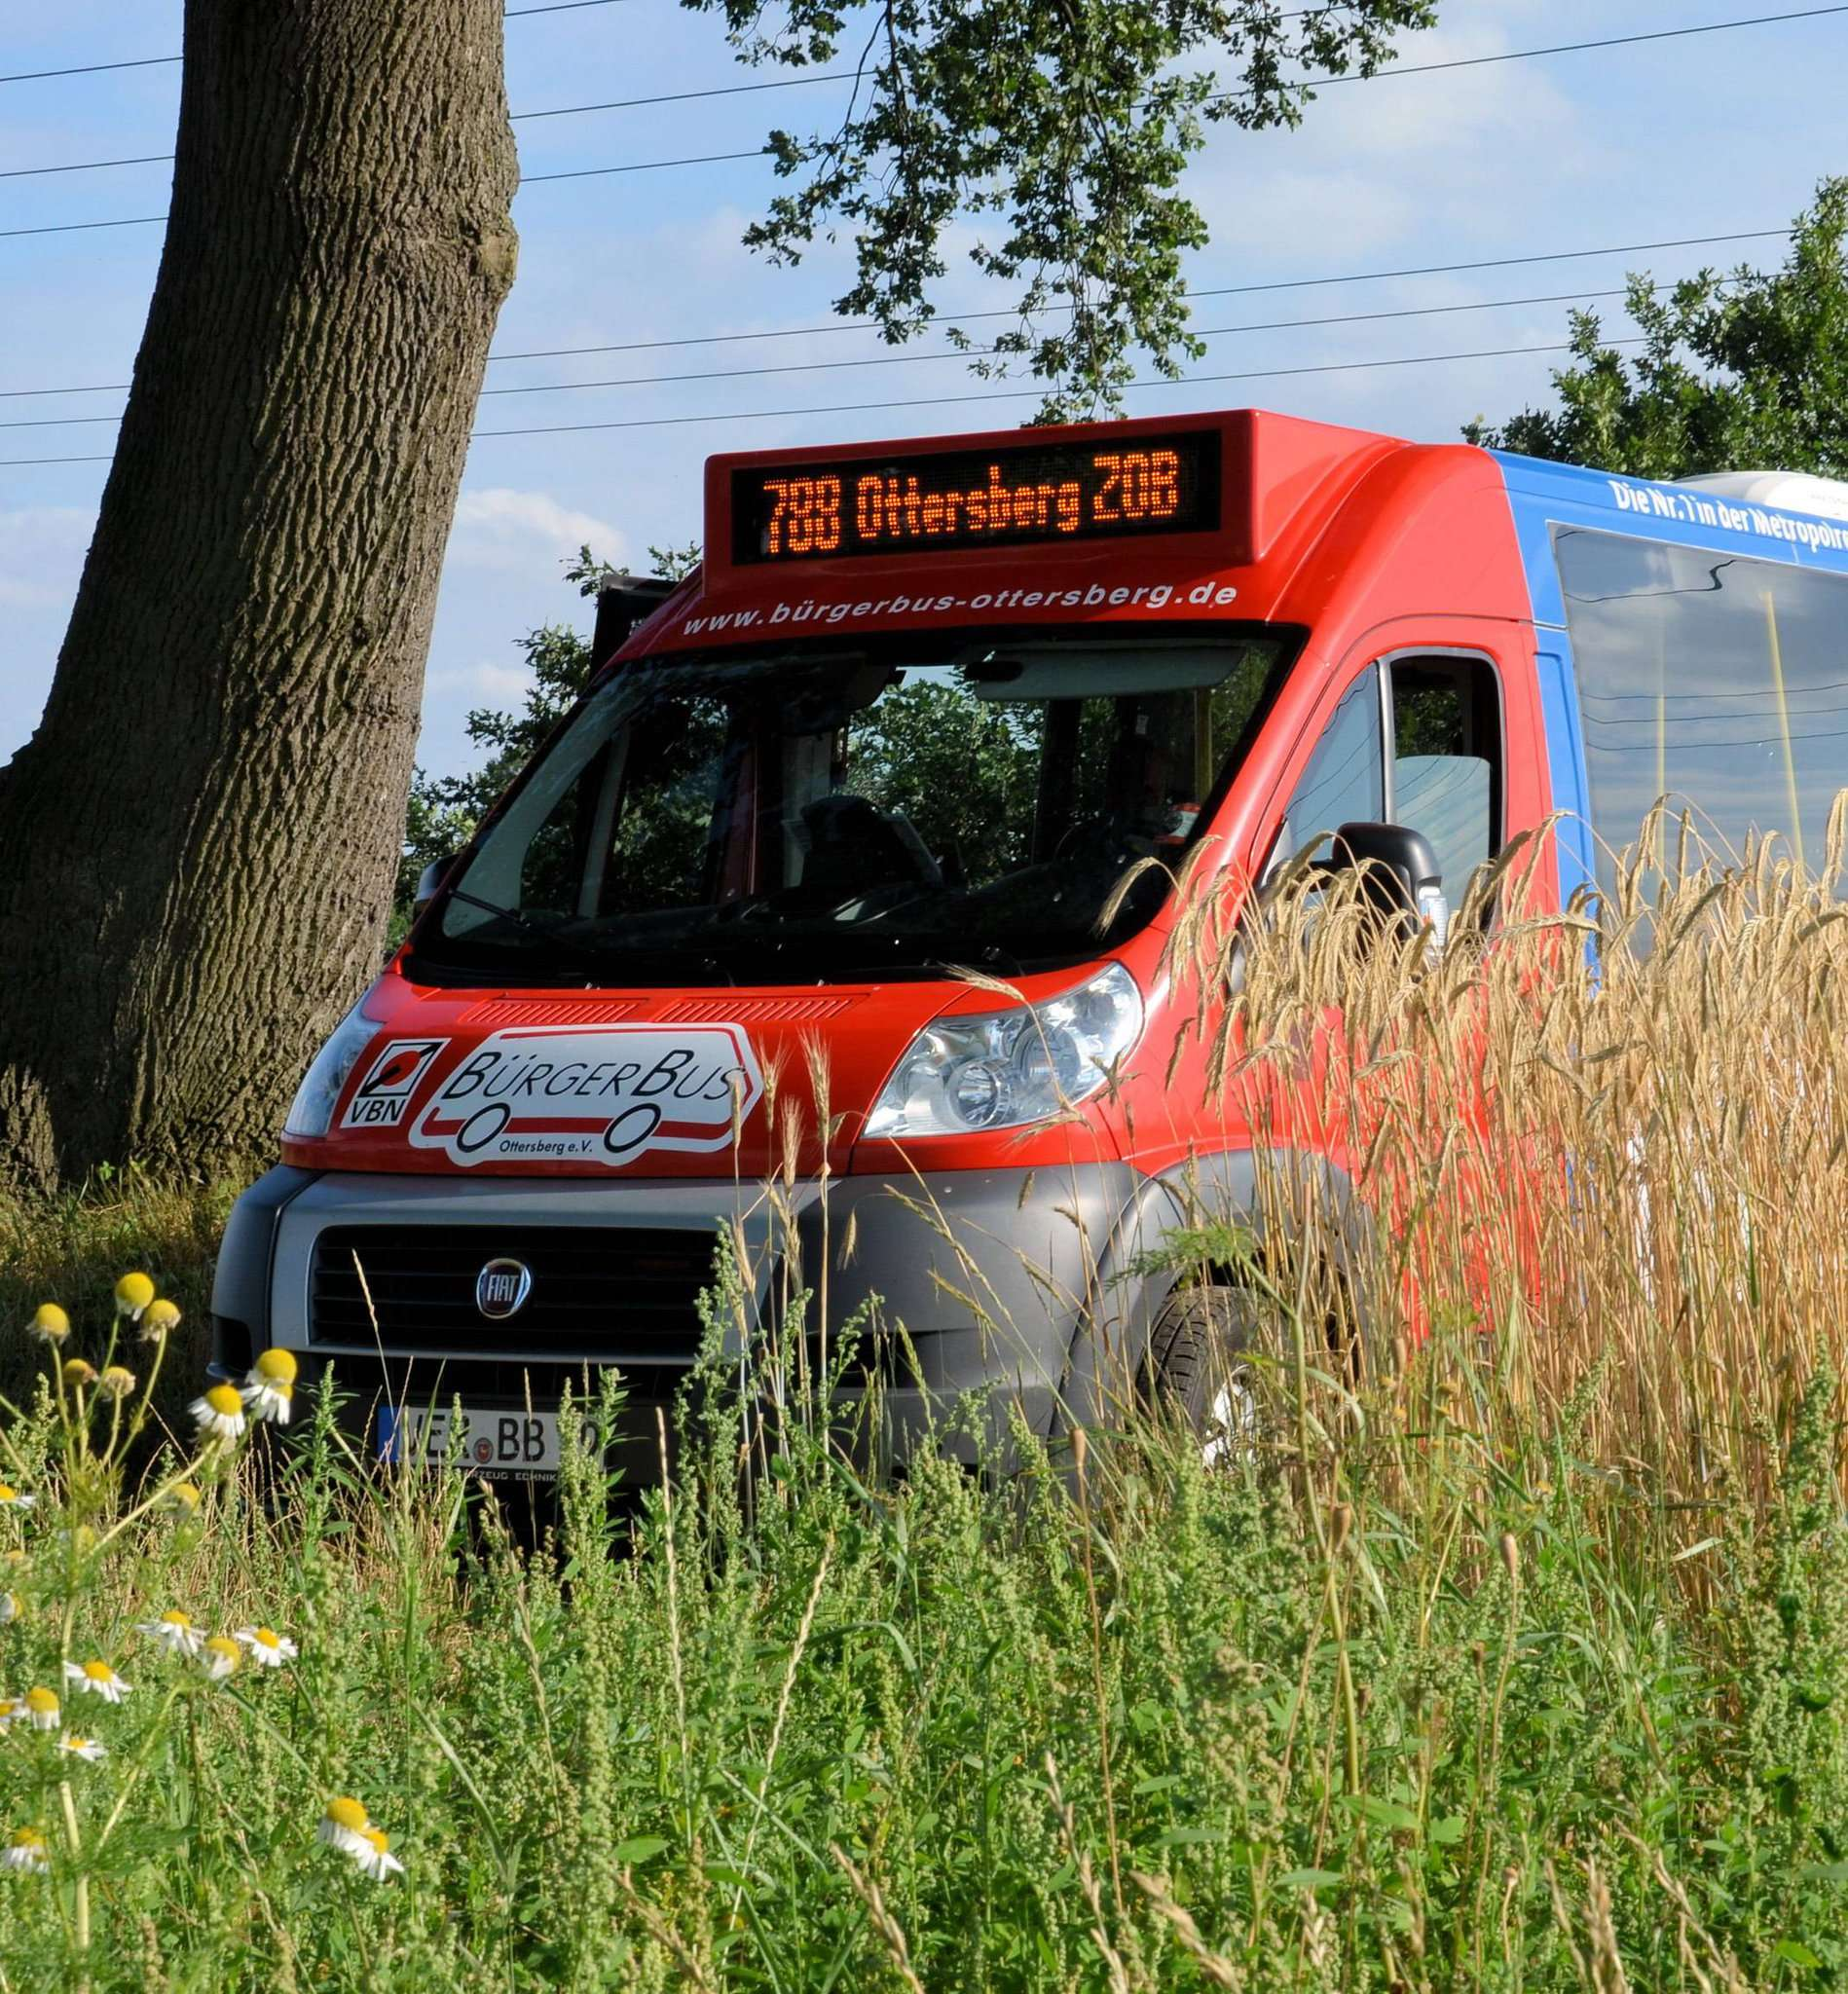 Der Bürgerbusverein in Ottersberg hat seinen Fahrplan angepasst.